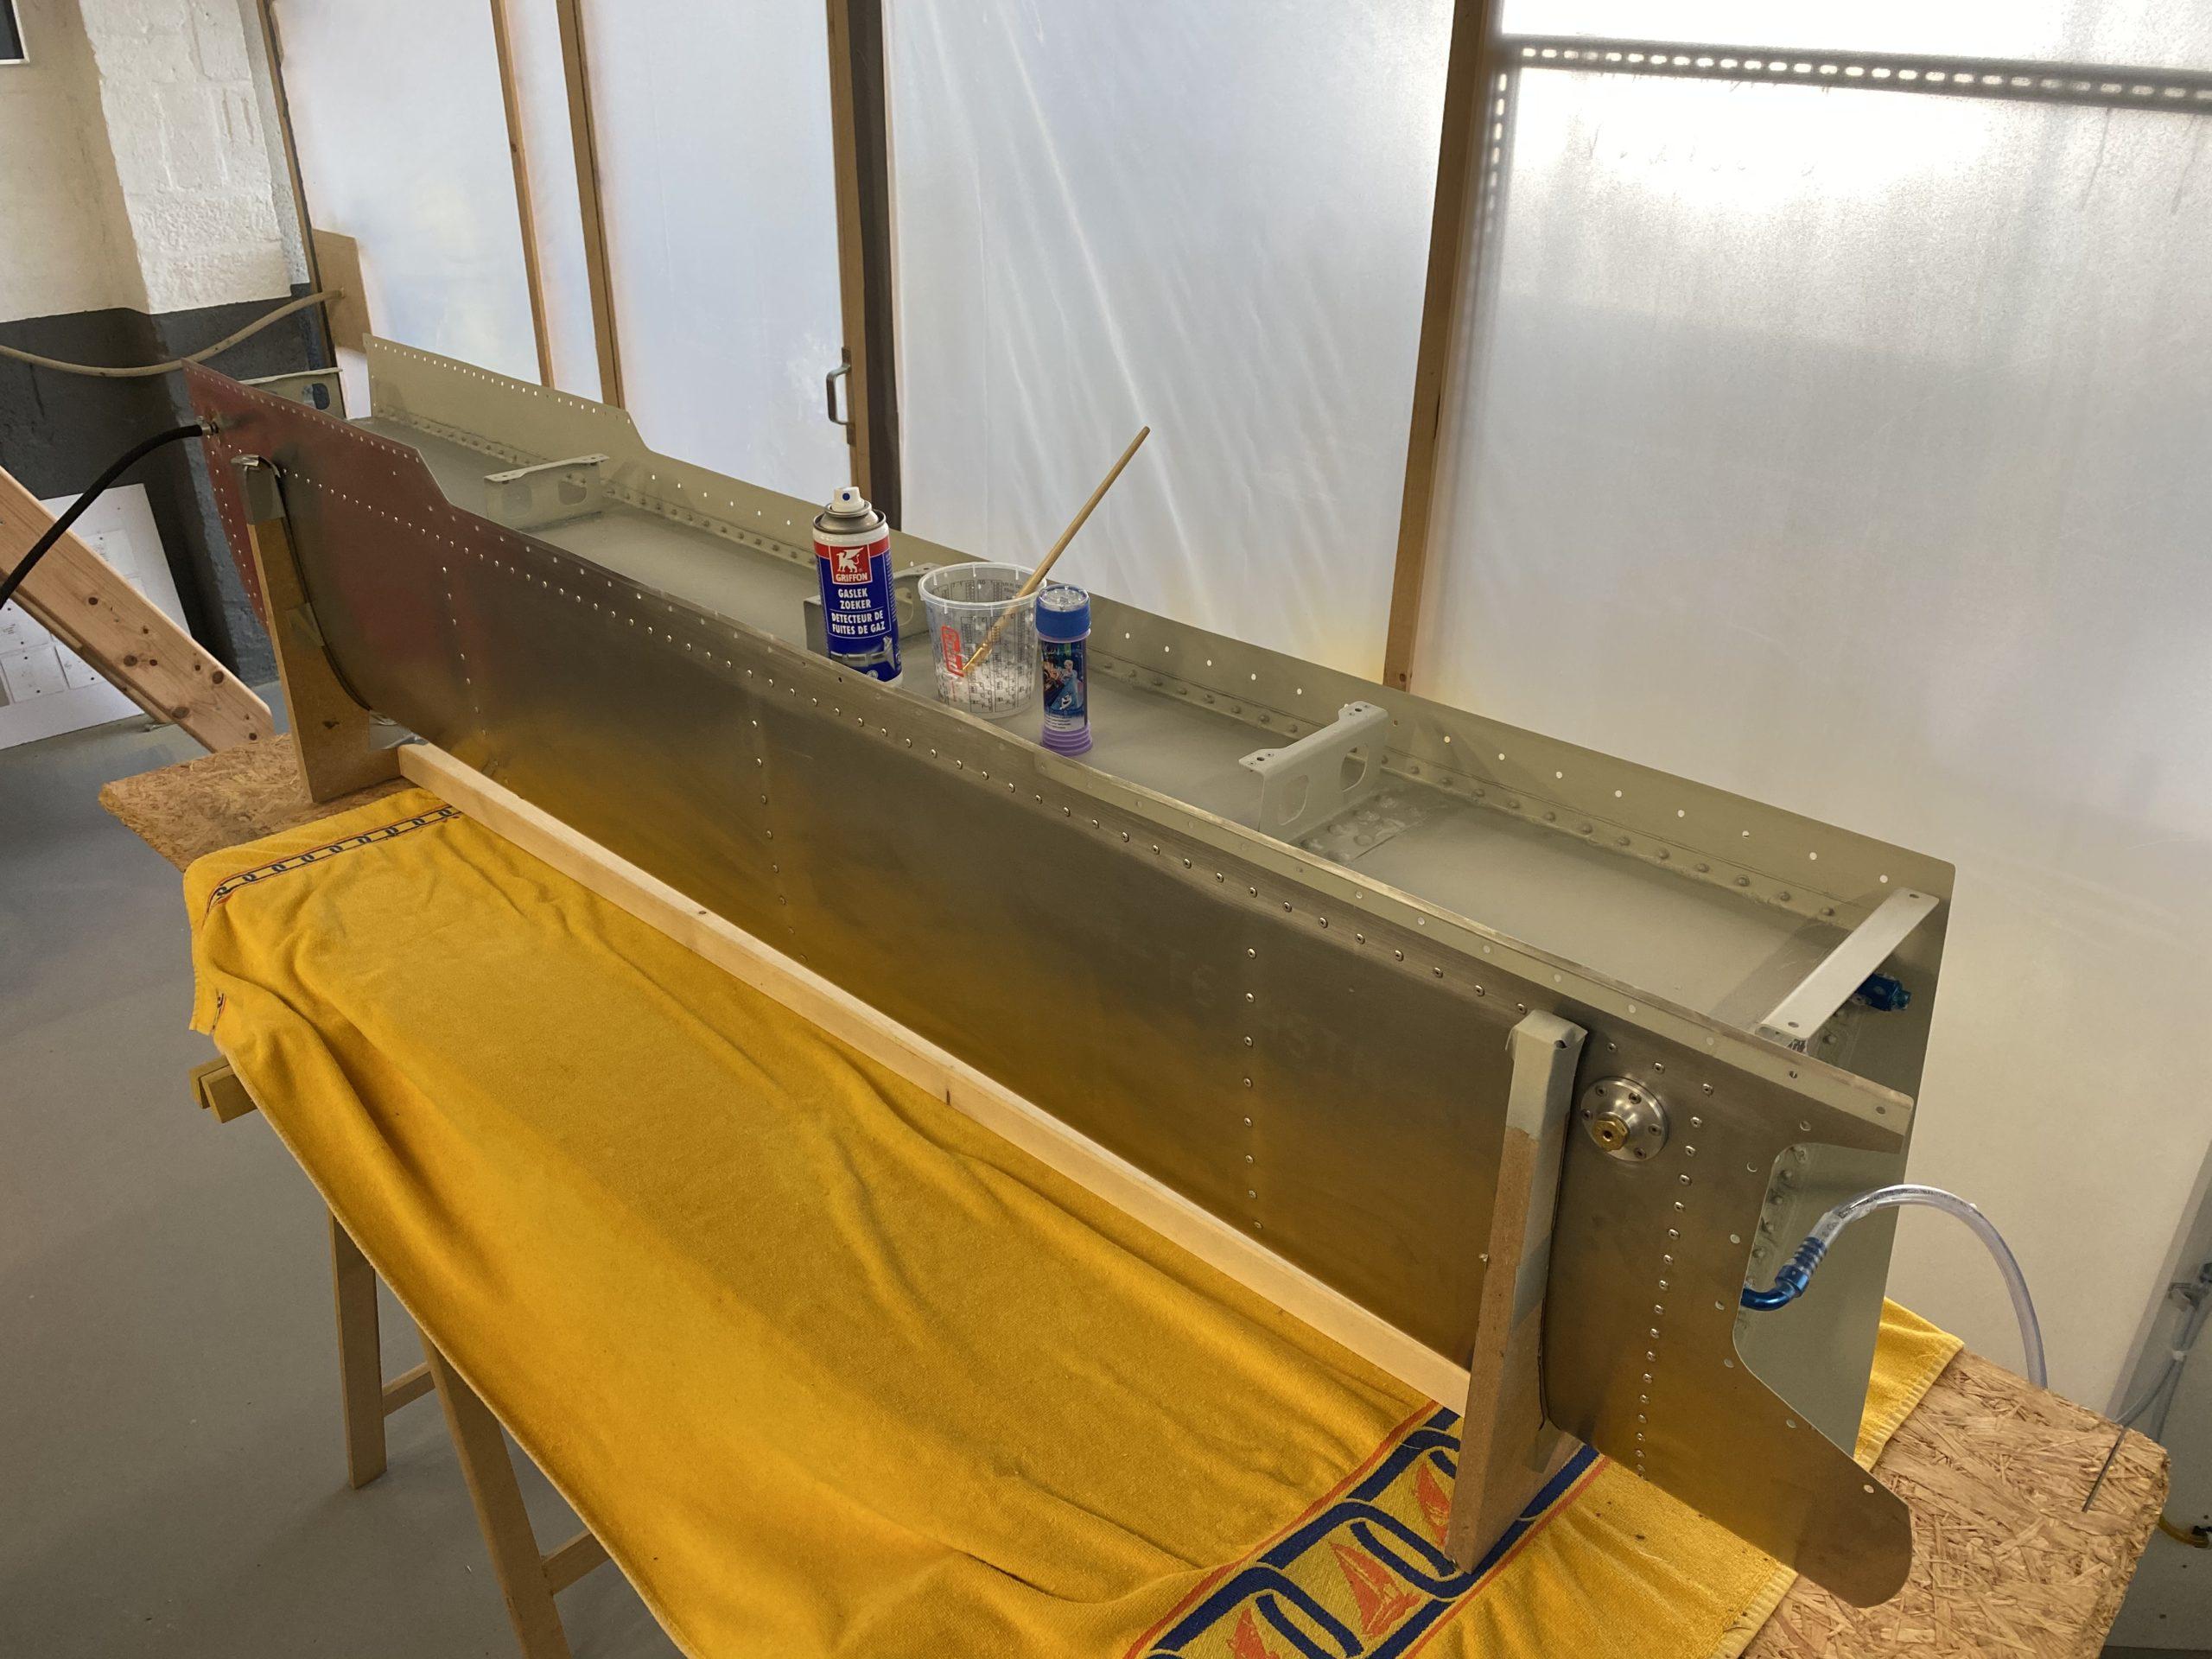 Fuel Tank Leak Test Sling2,Dewalt Best Cordless Drill